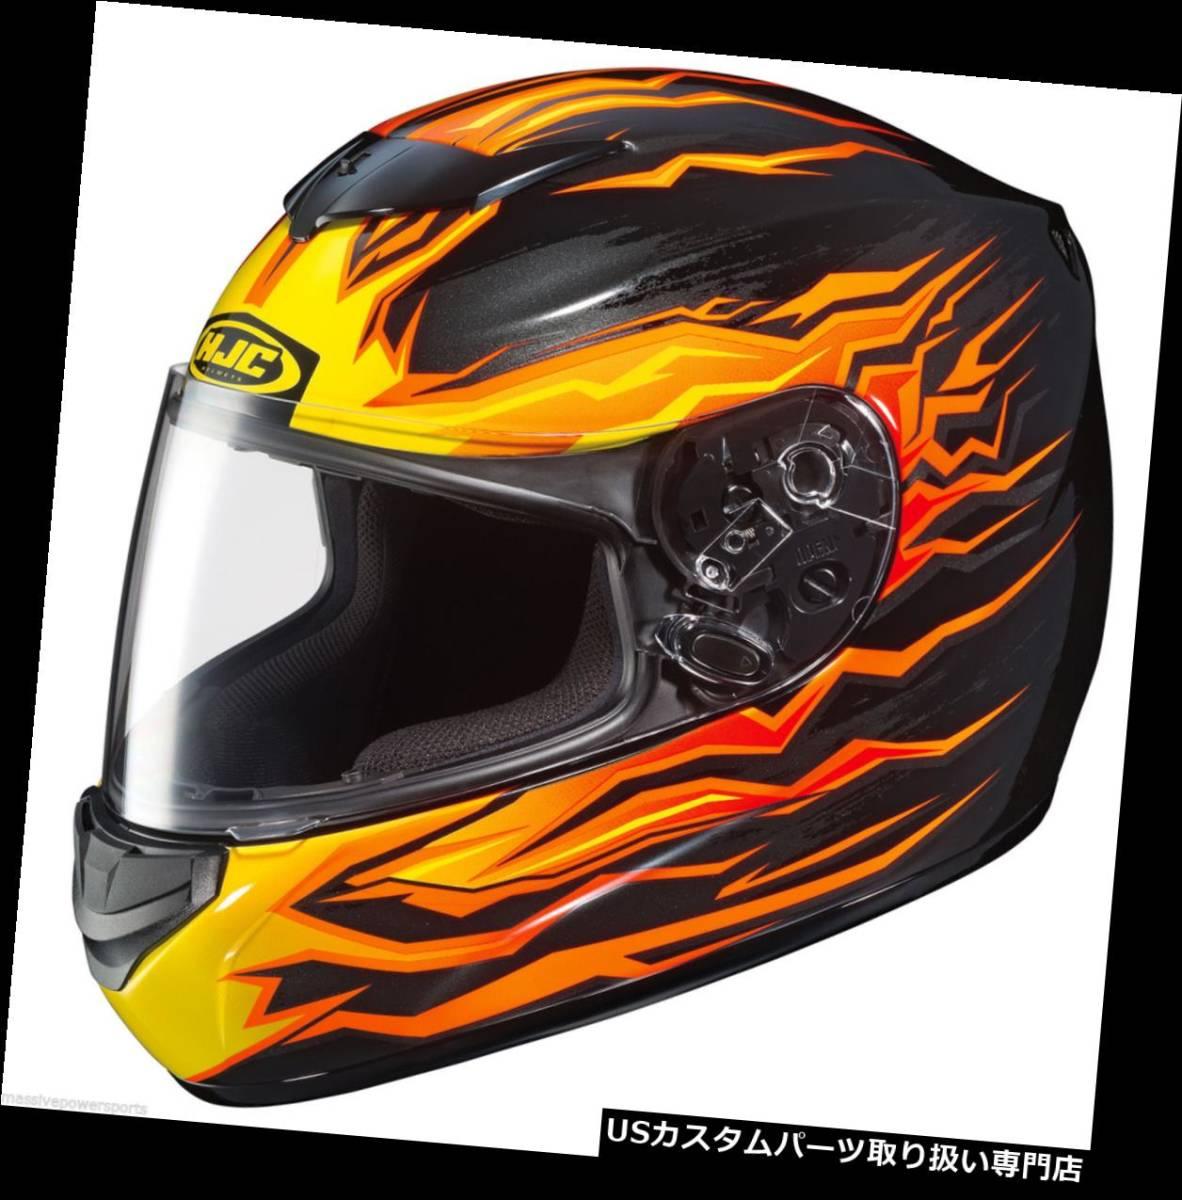 HJC CS-R2 Flame Motorcycle Helmet Black Orange L LG Large Full Face